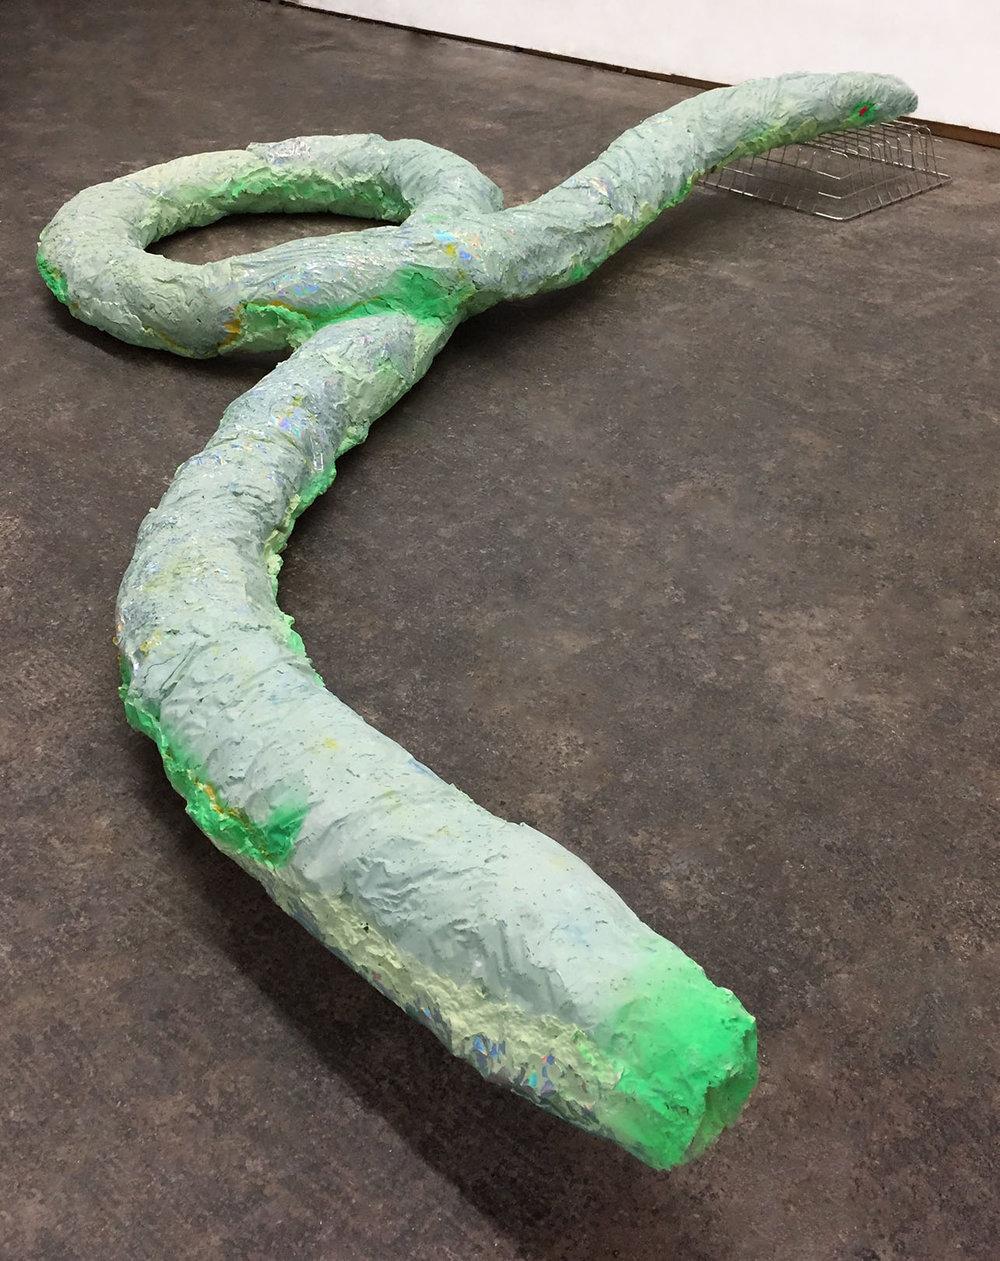 snakesidefeb12lrg.jpg